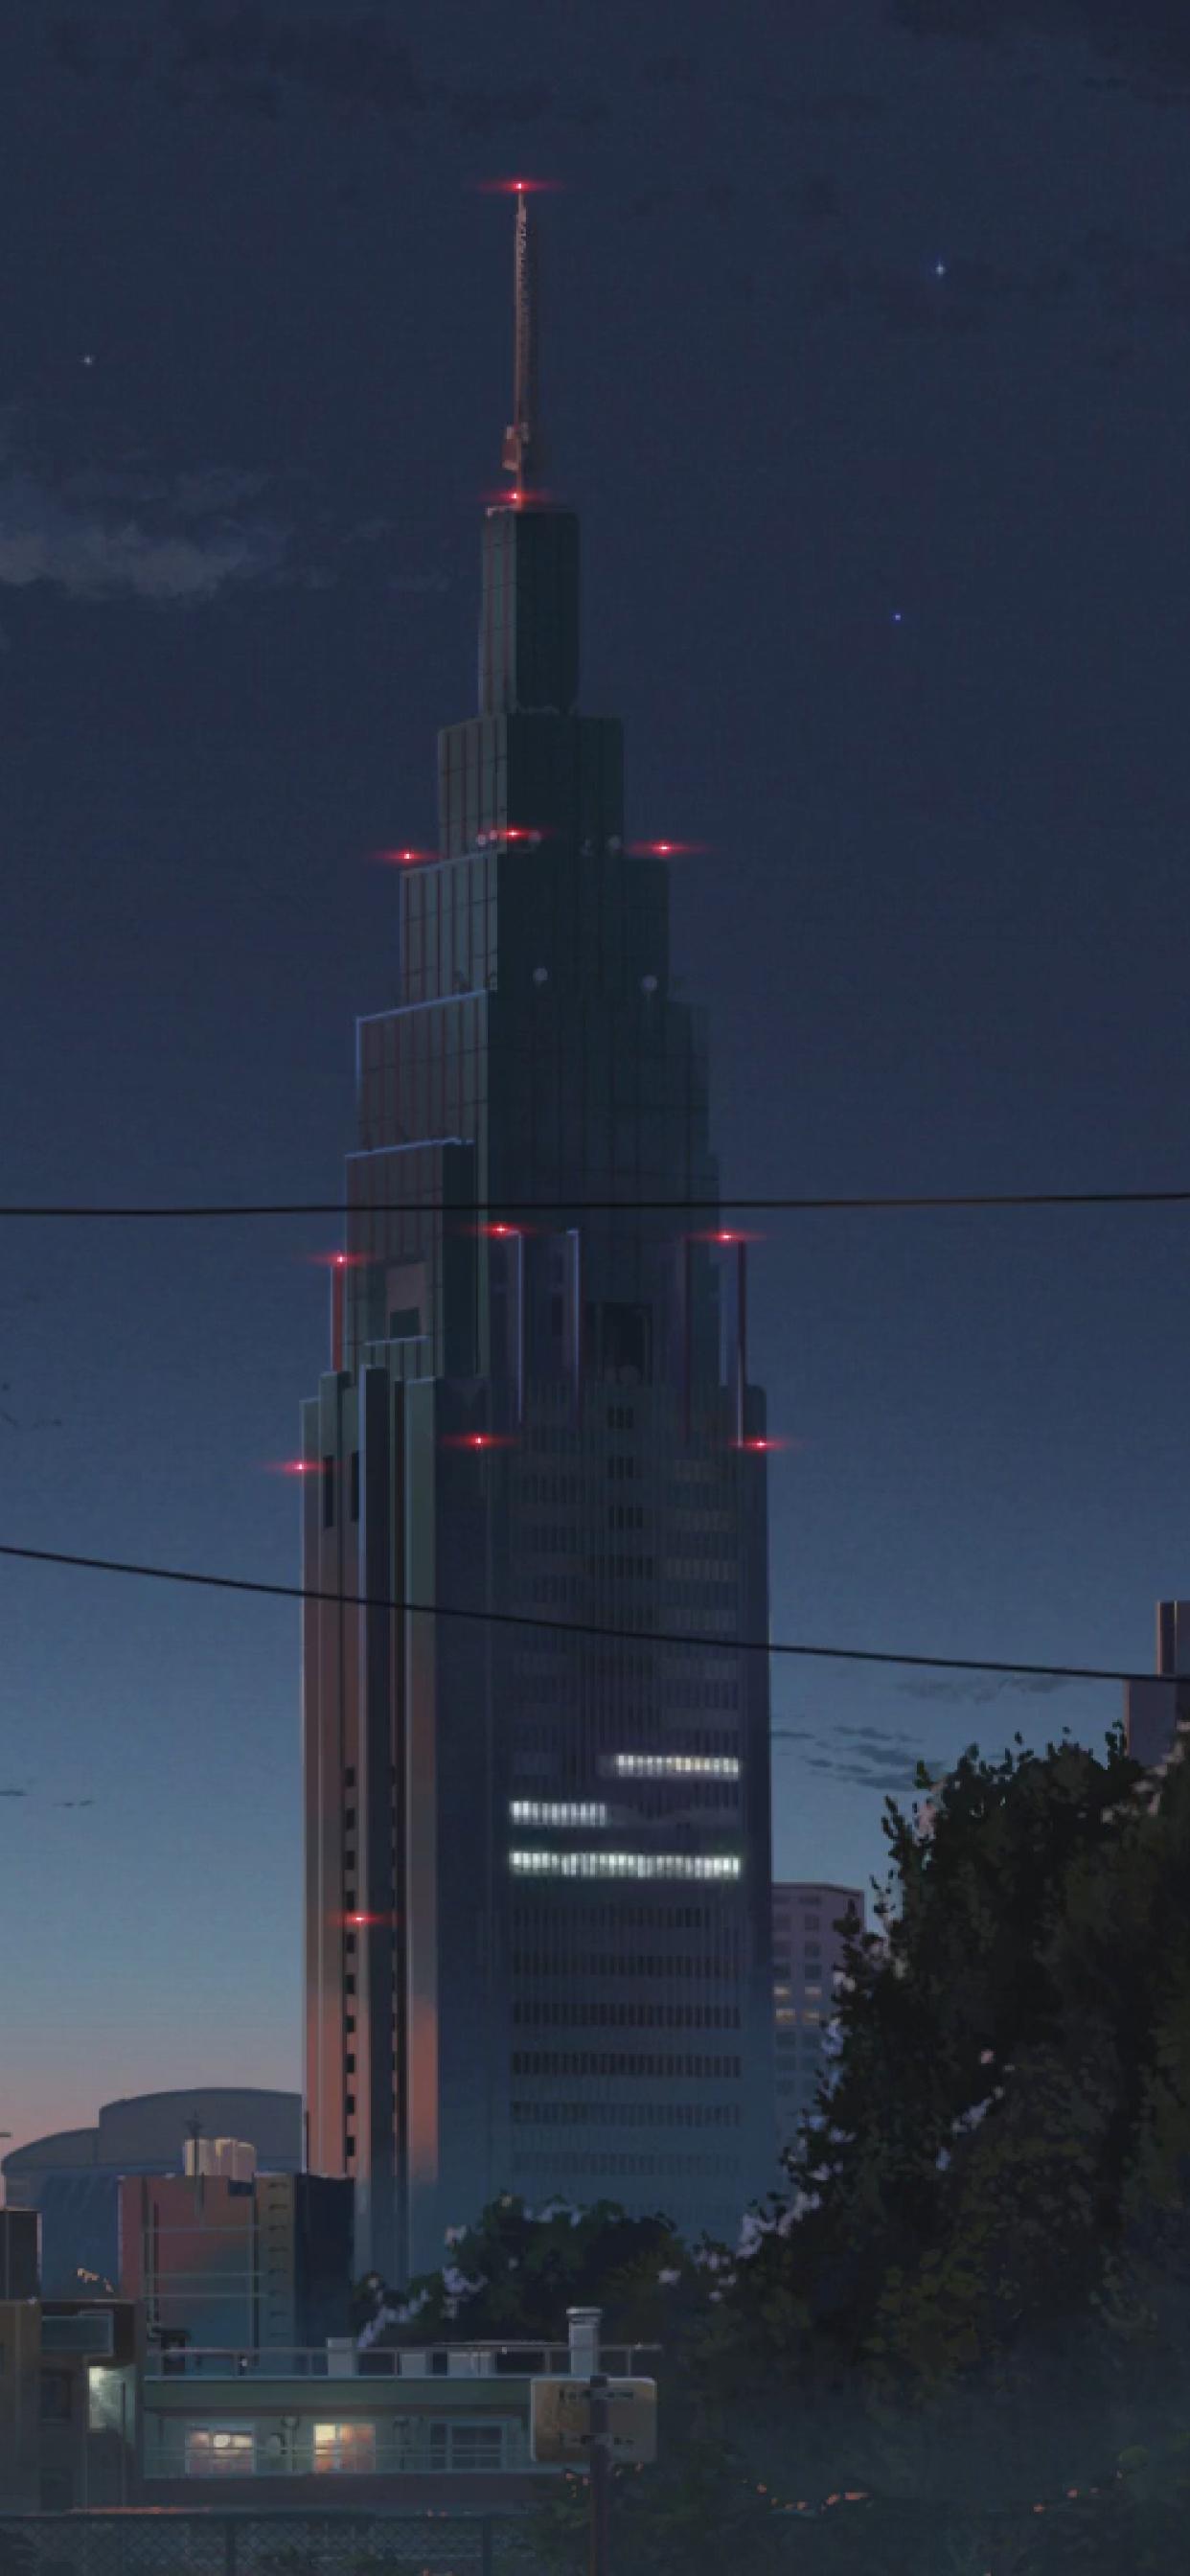 Anime Building Background Night